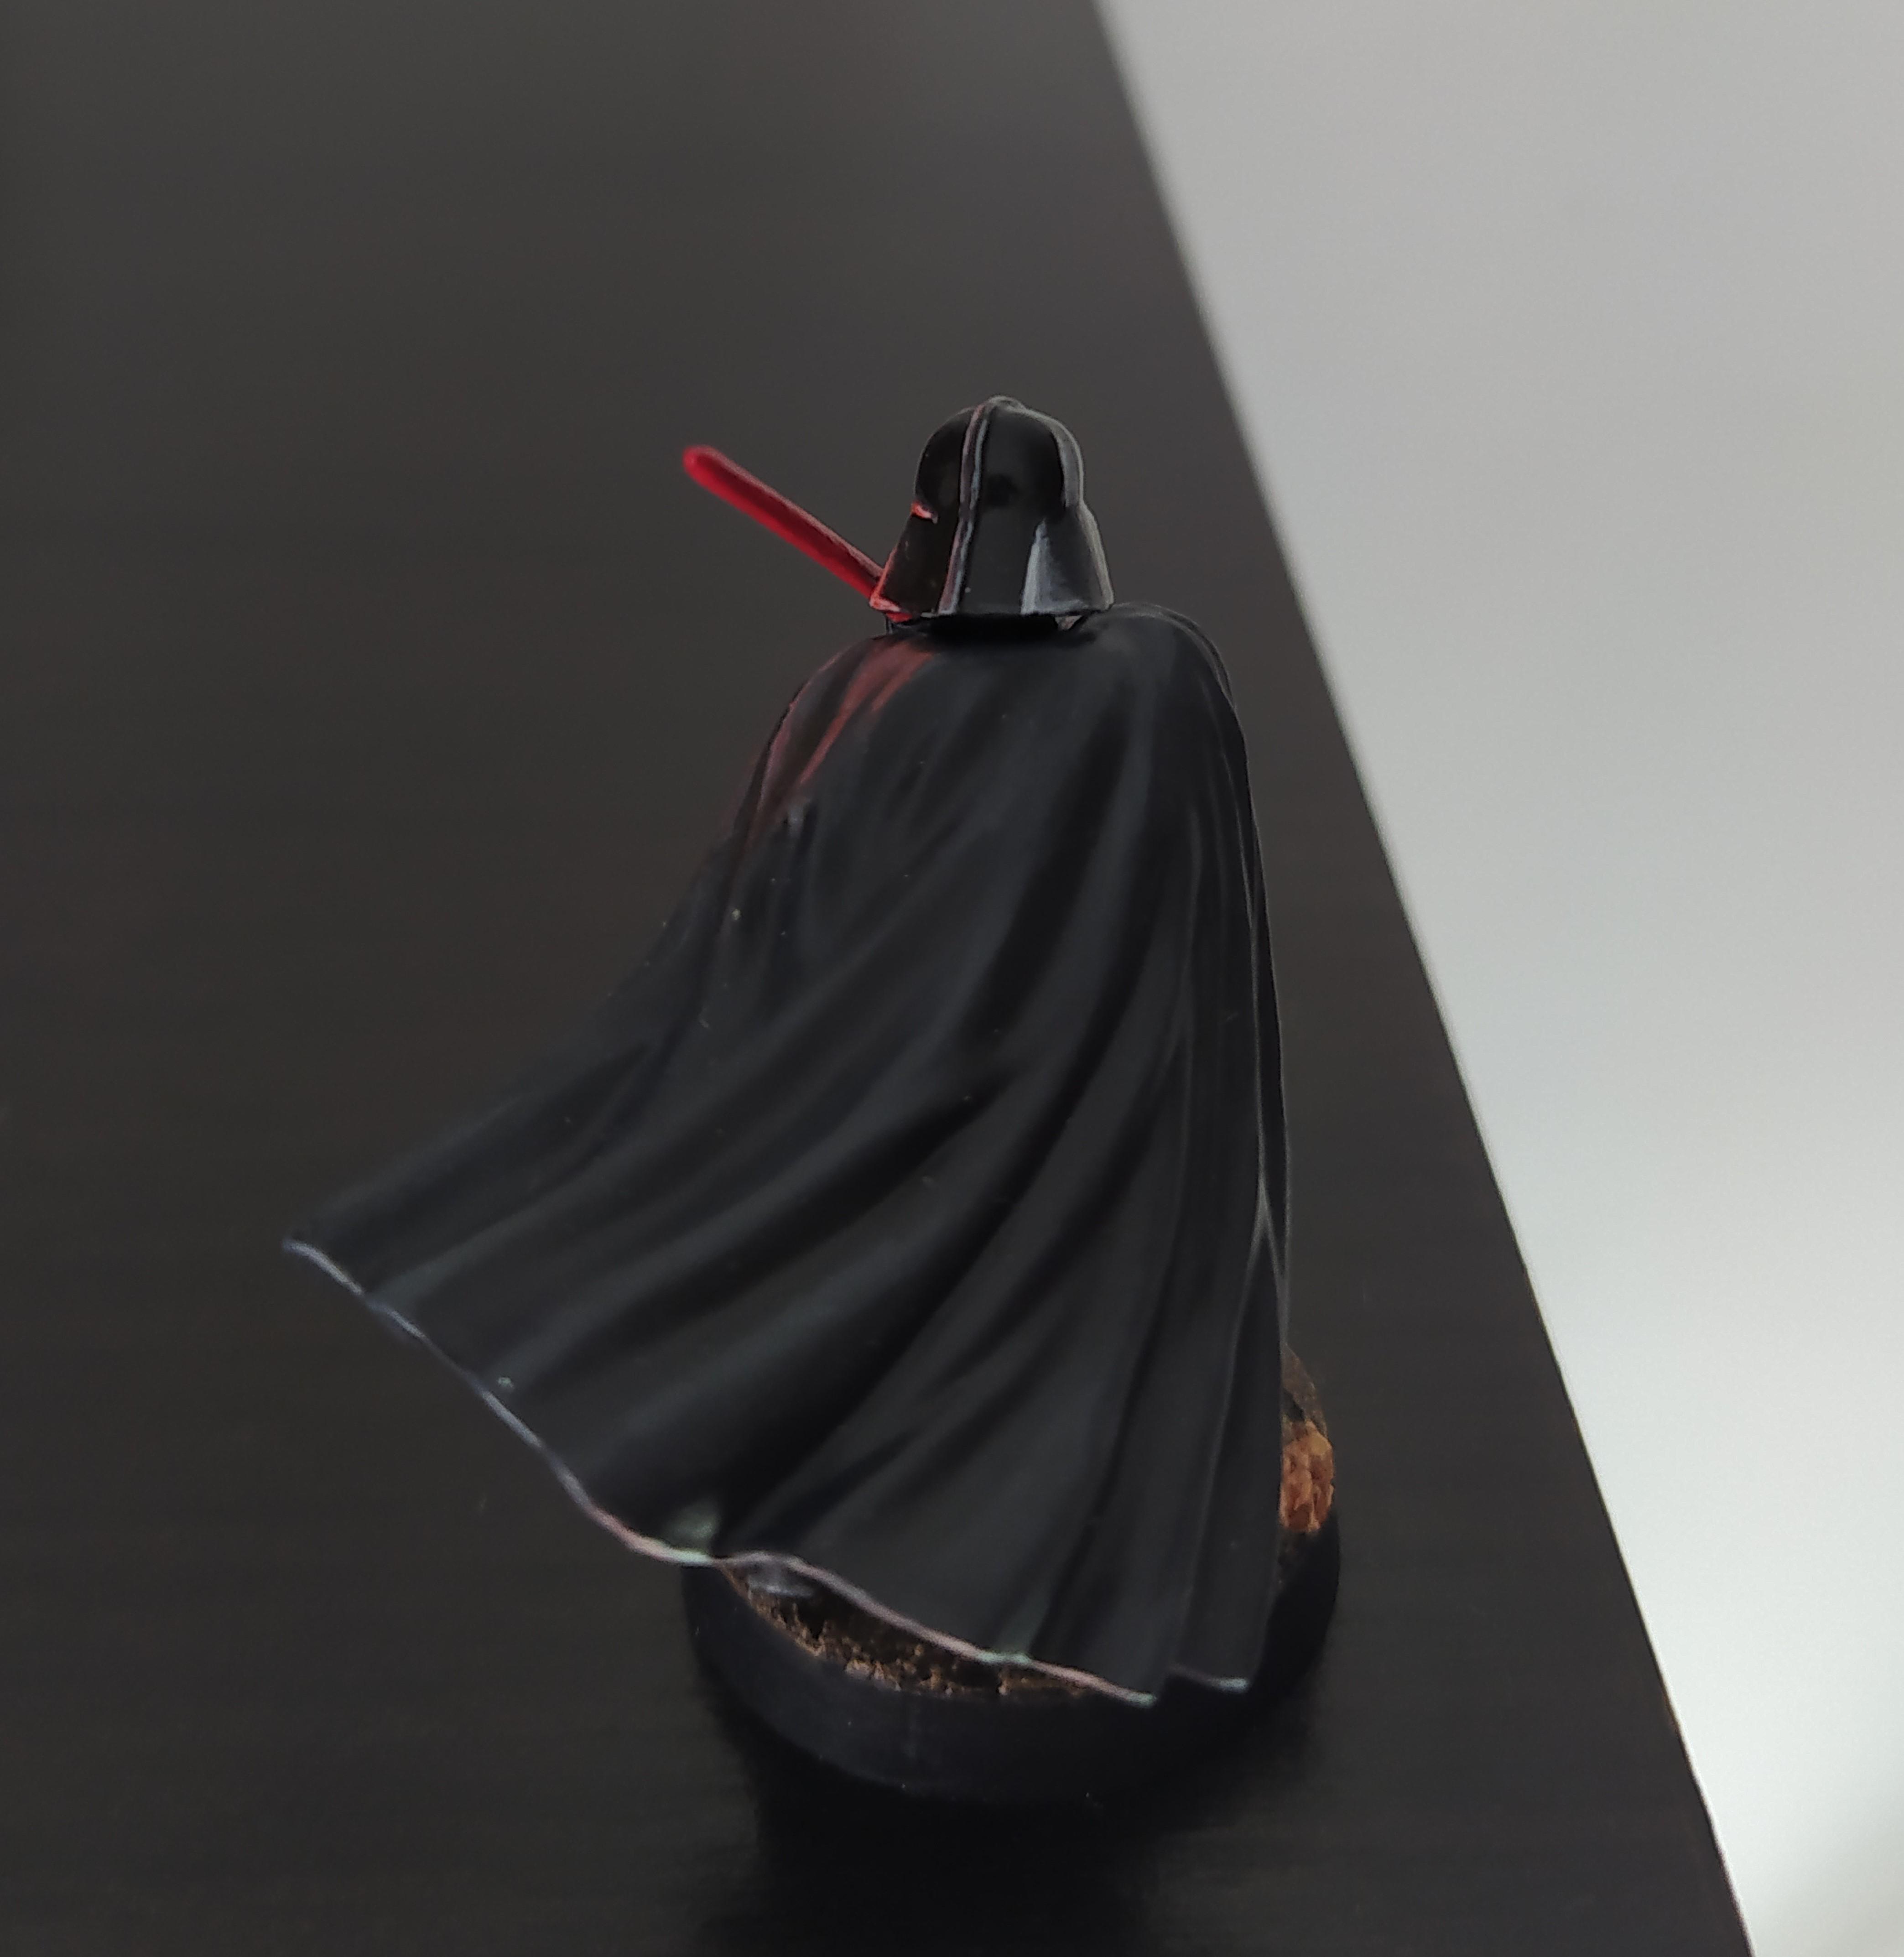 Darth Vader, Object Source Lighting, Star Wars Legion